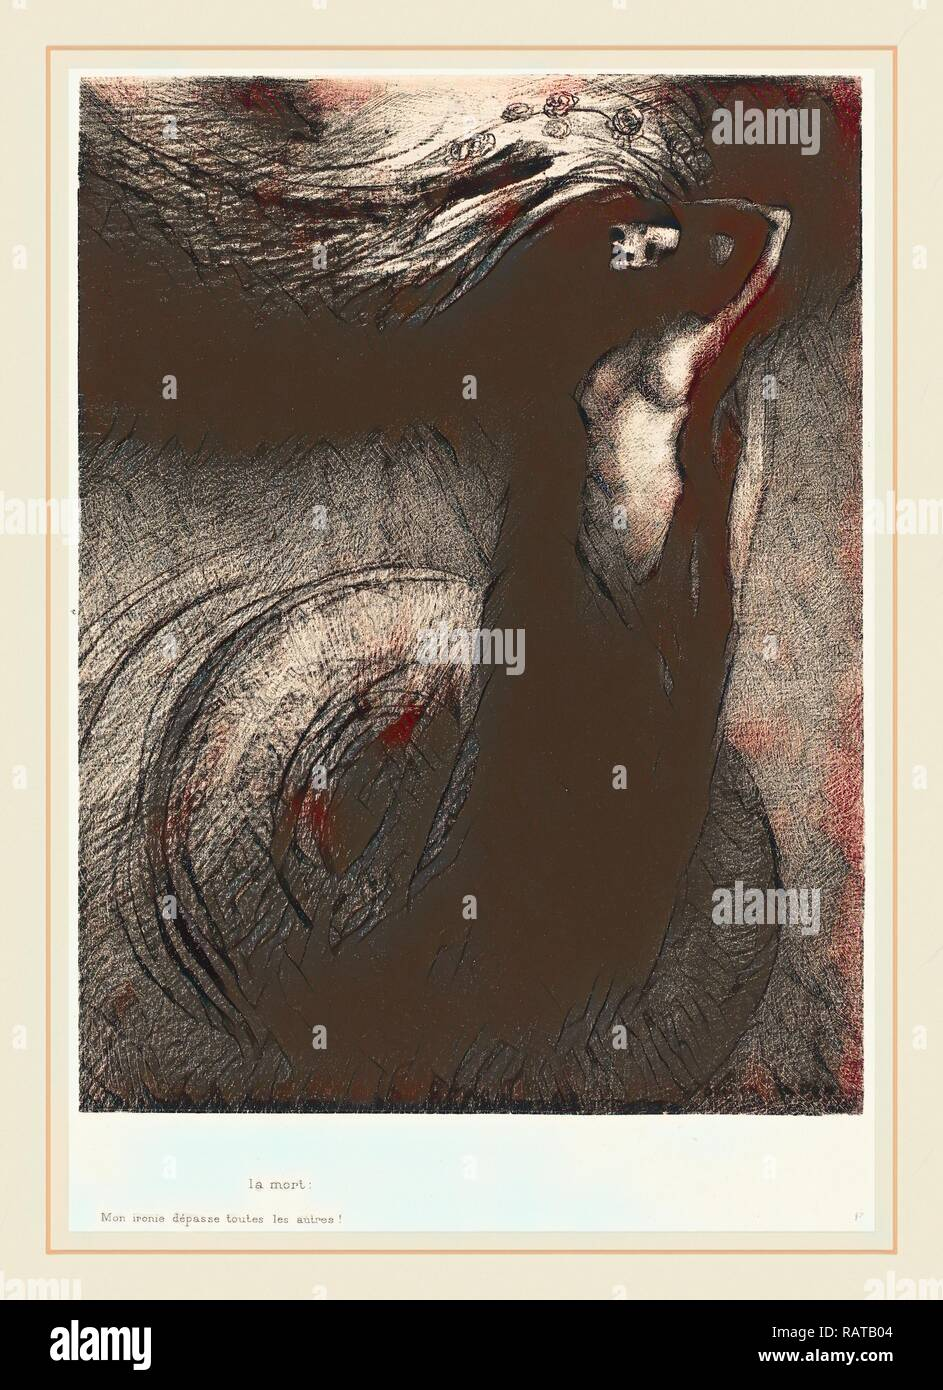 Odilon Redon (French, 1840-1916), La Mort: Mon ironie depasse toutes les autres! (Death: My iron surpasses all others reimagined - Stock Image